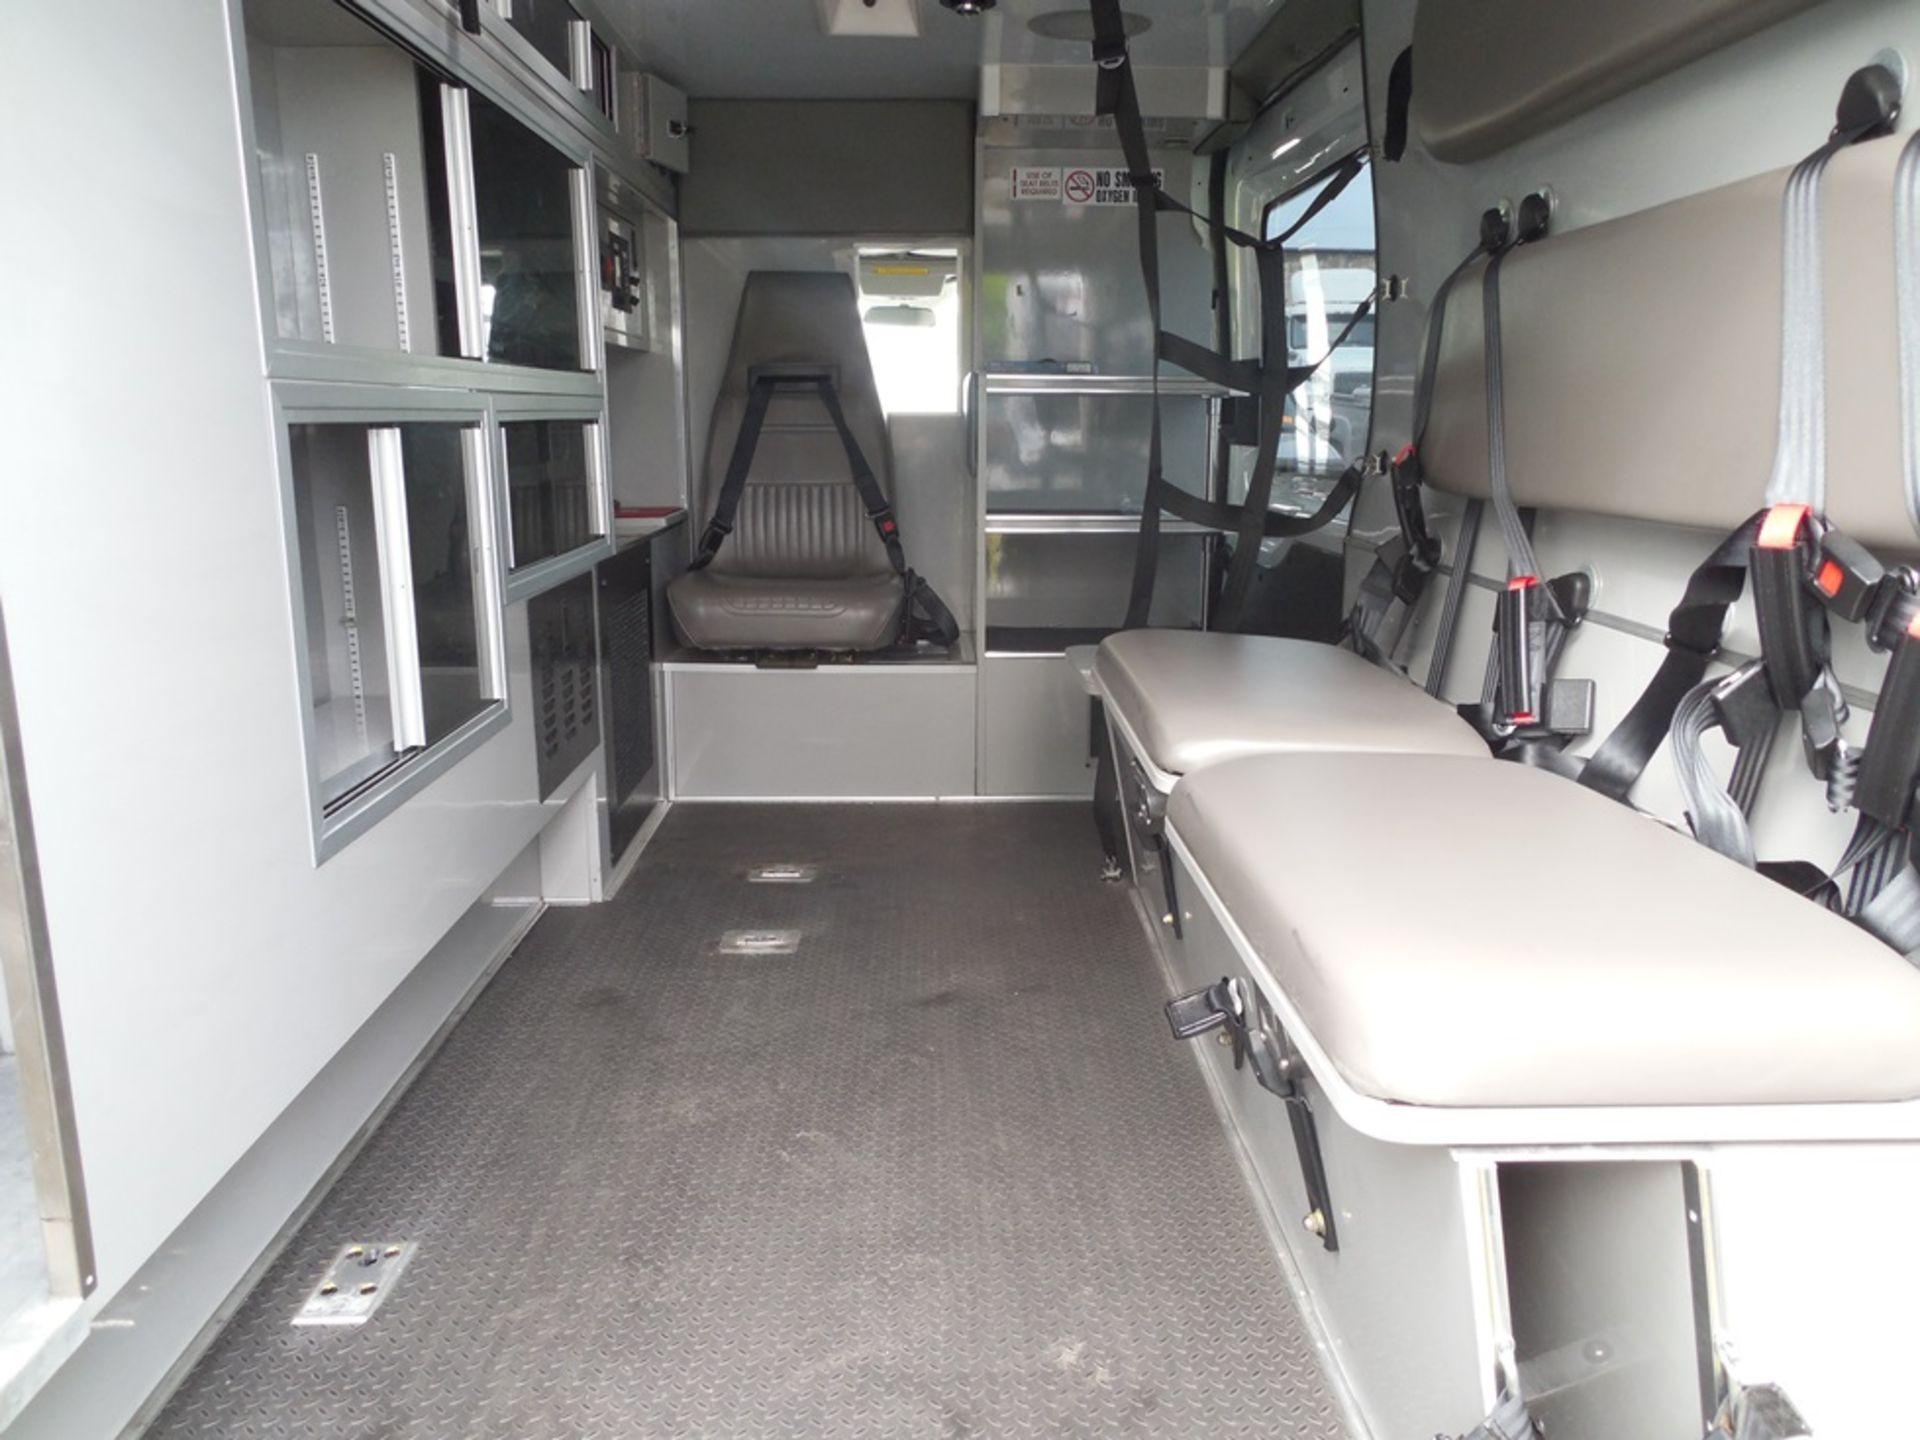 2015 Ford Tansit 250 dsl ambulance 98,714 miles vin# 1FDYR2CV4FKB33641 - Image 6 of 6